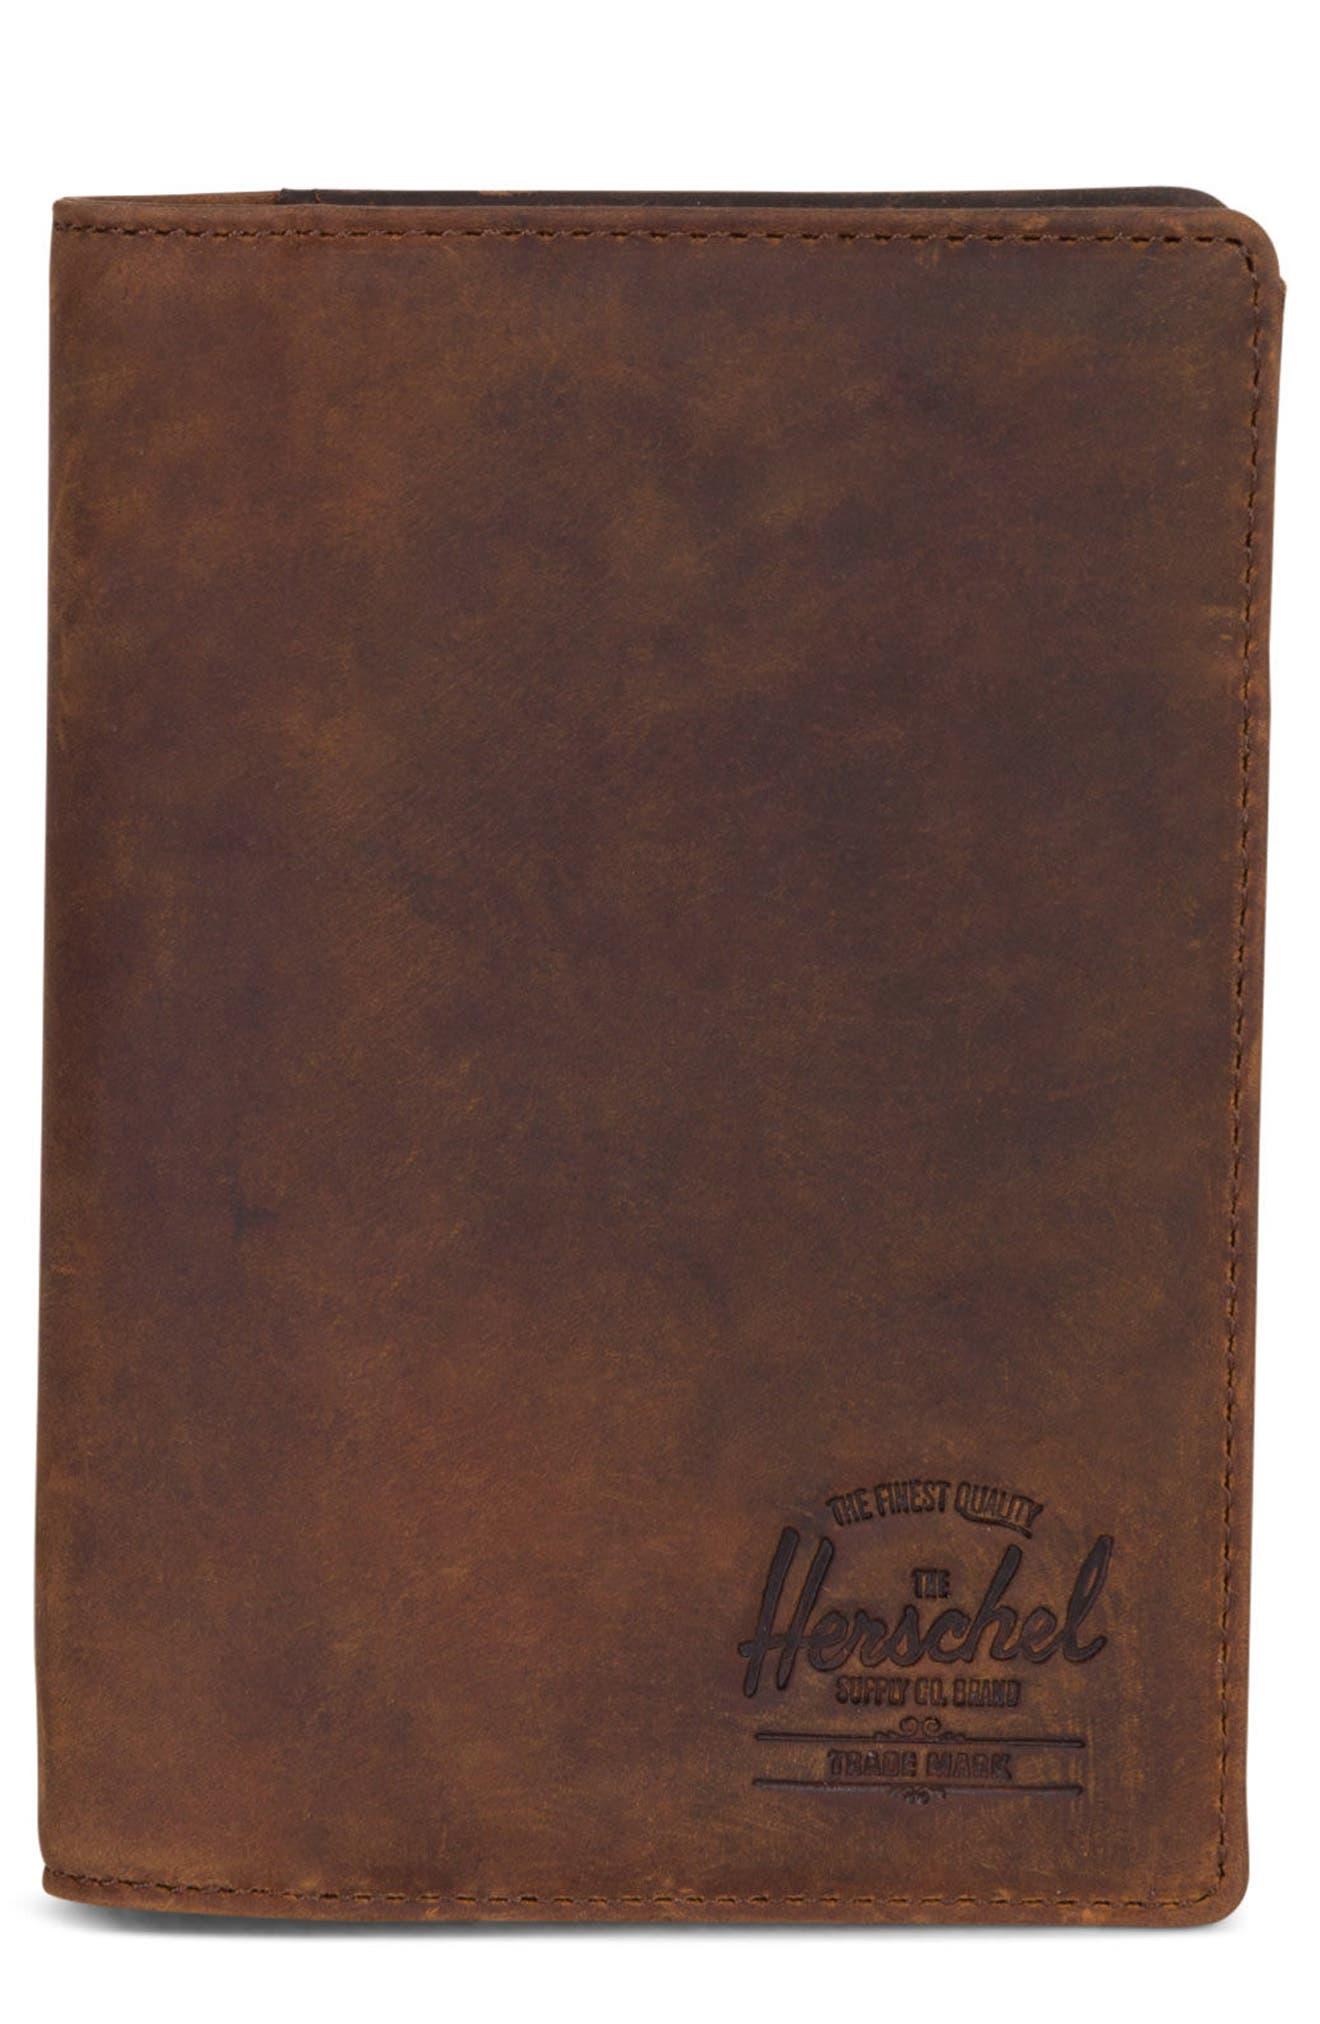 Main Image - Herschel Supply Co. Raynor Nubuck Leather Passport Holder